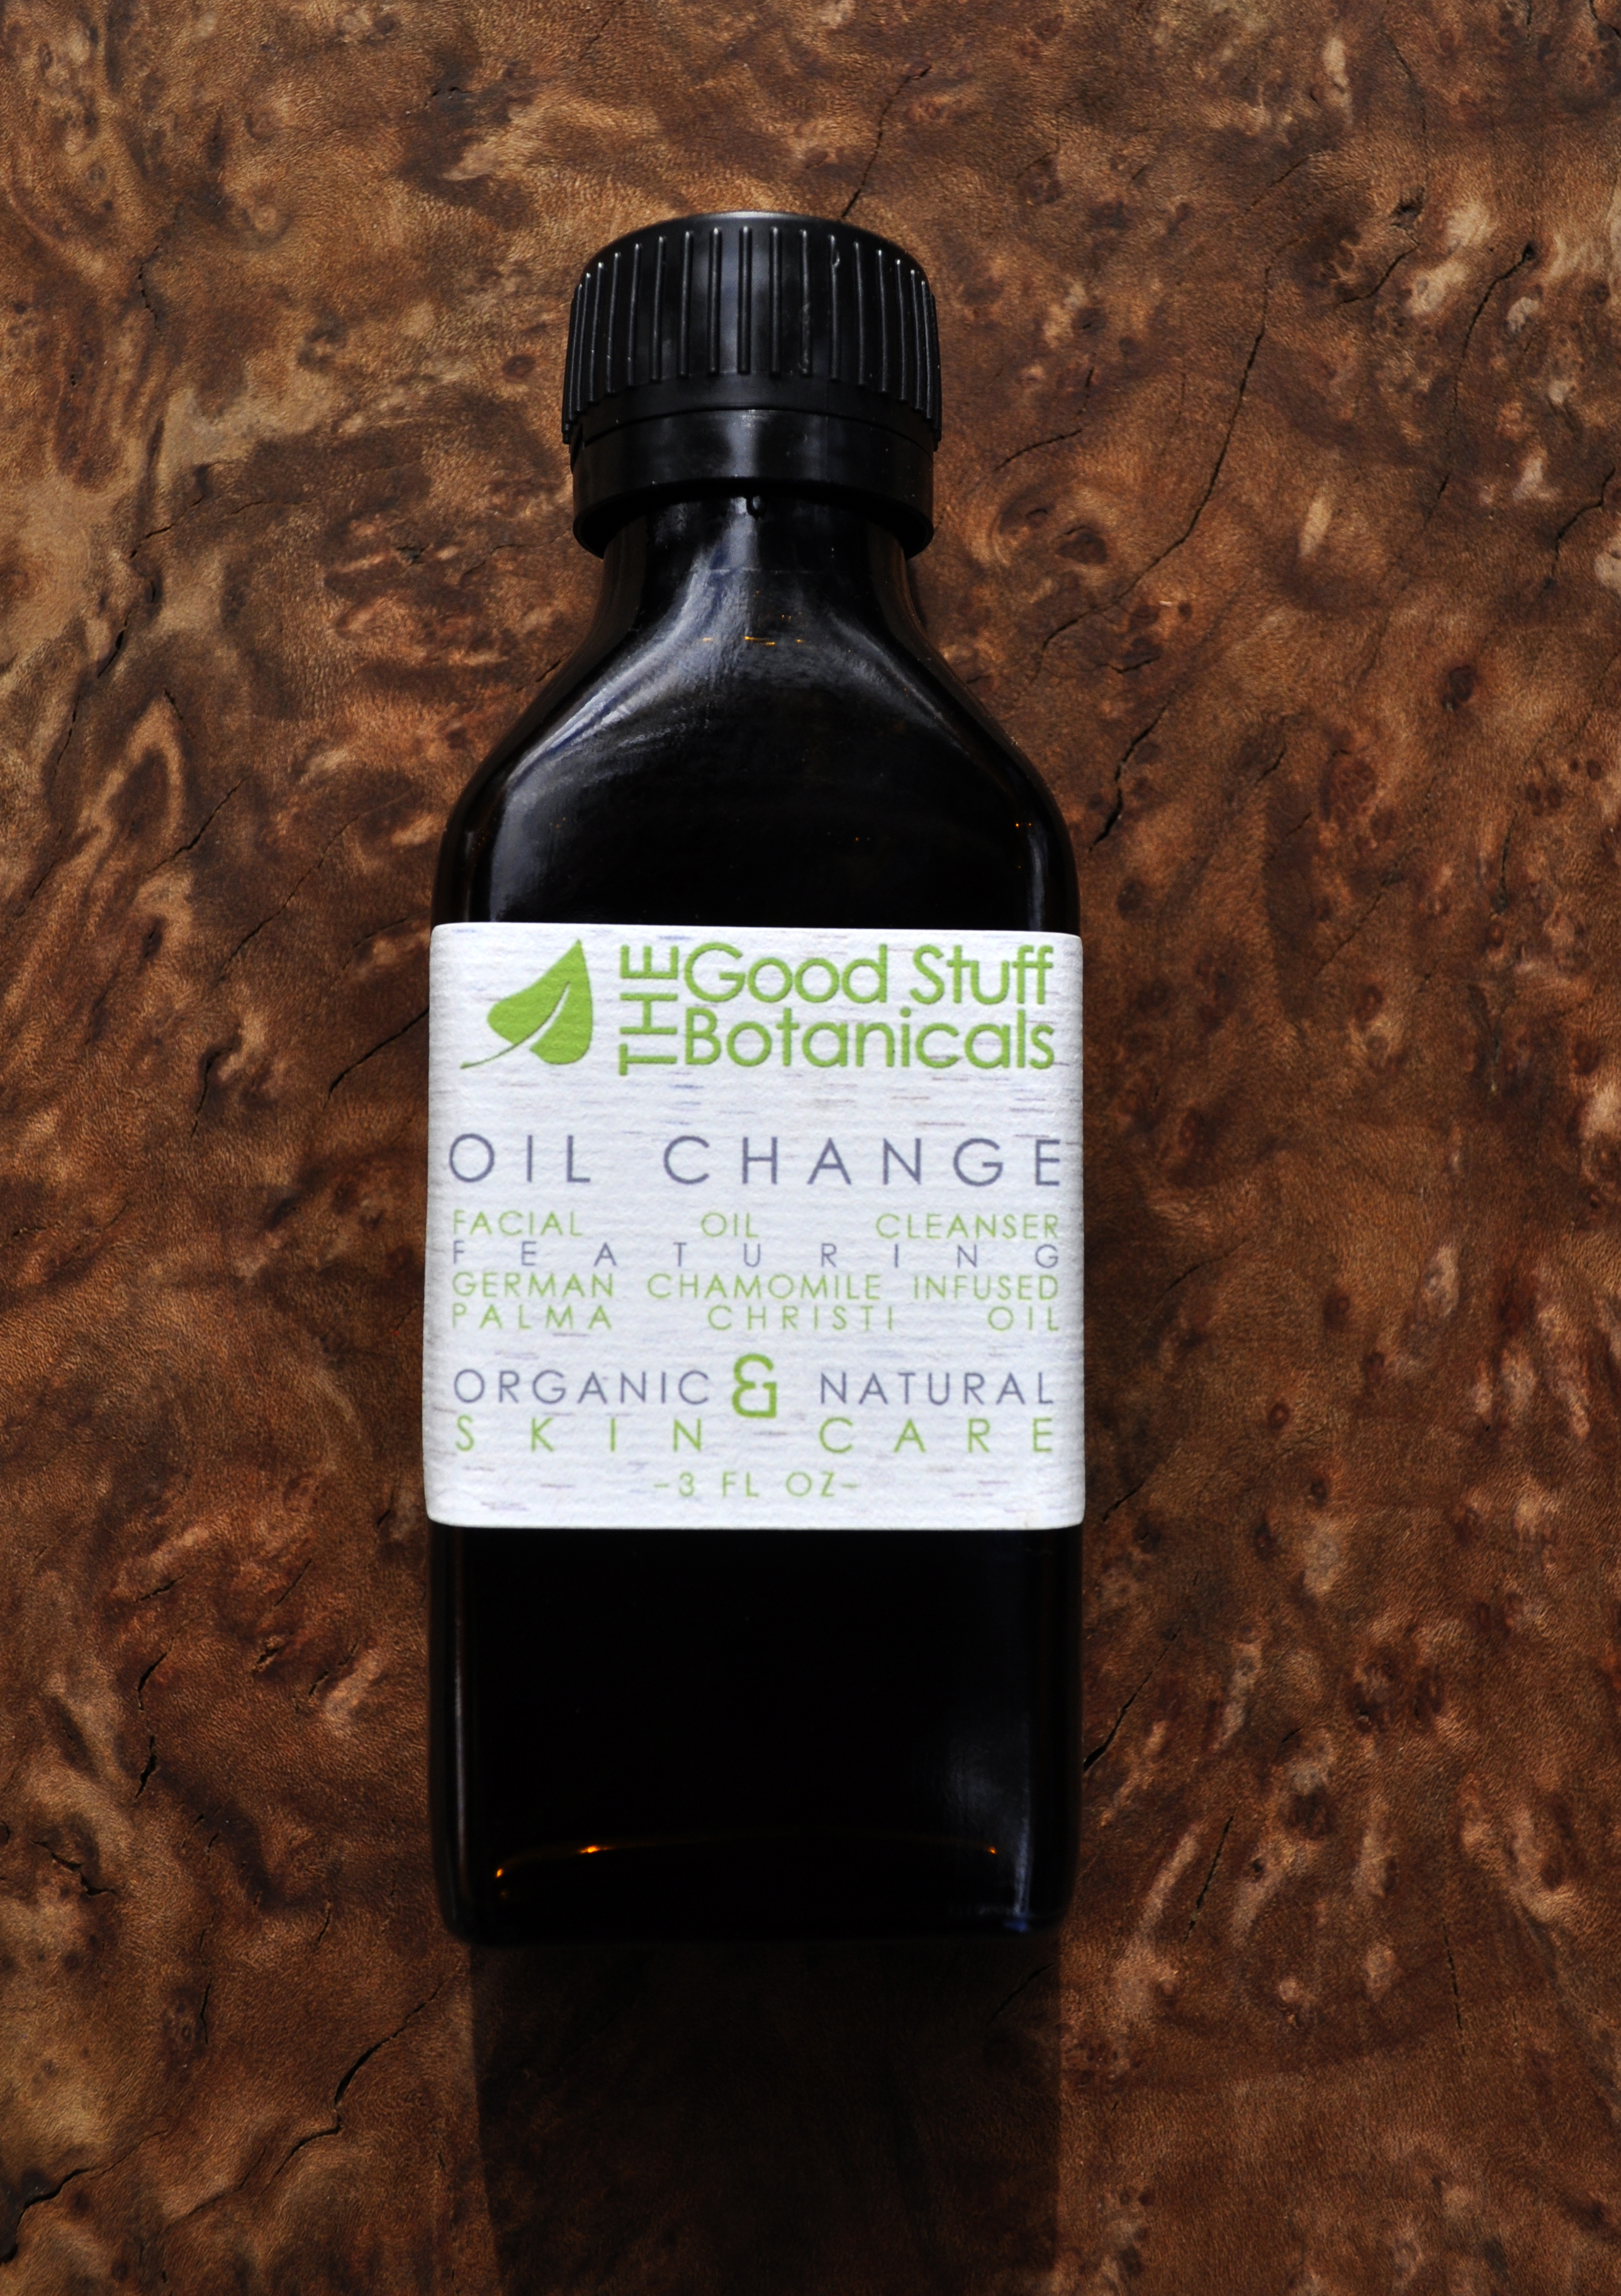 oil-change-4-the-good-stuff-botanicals.jpg